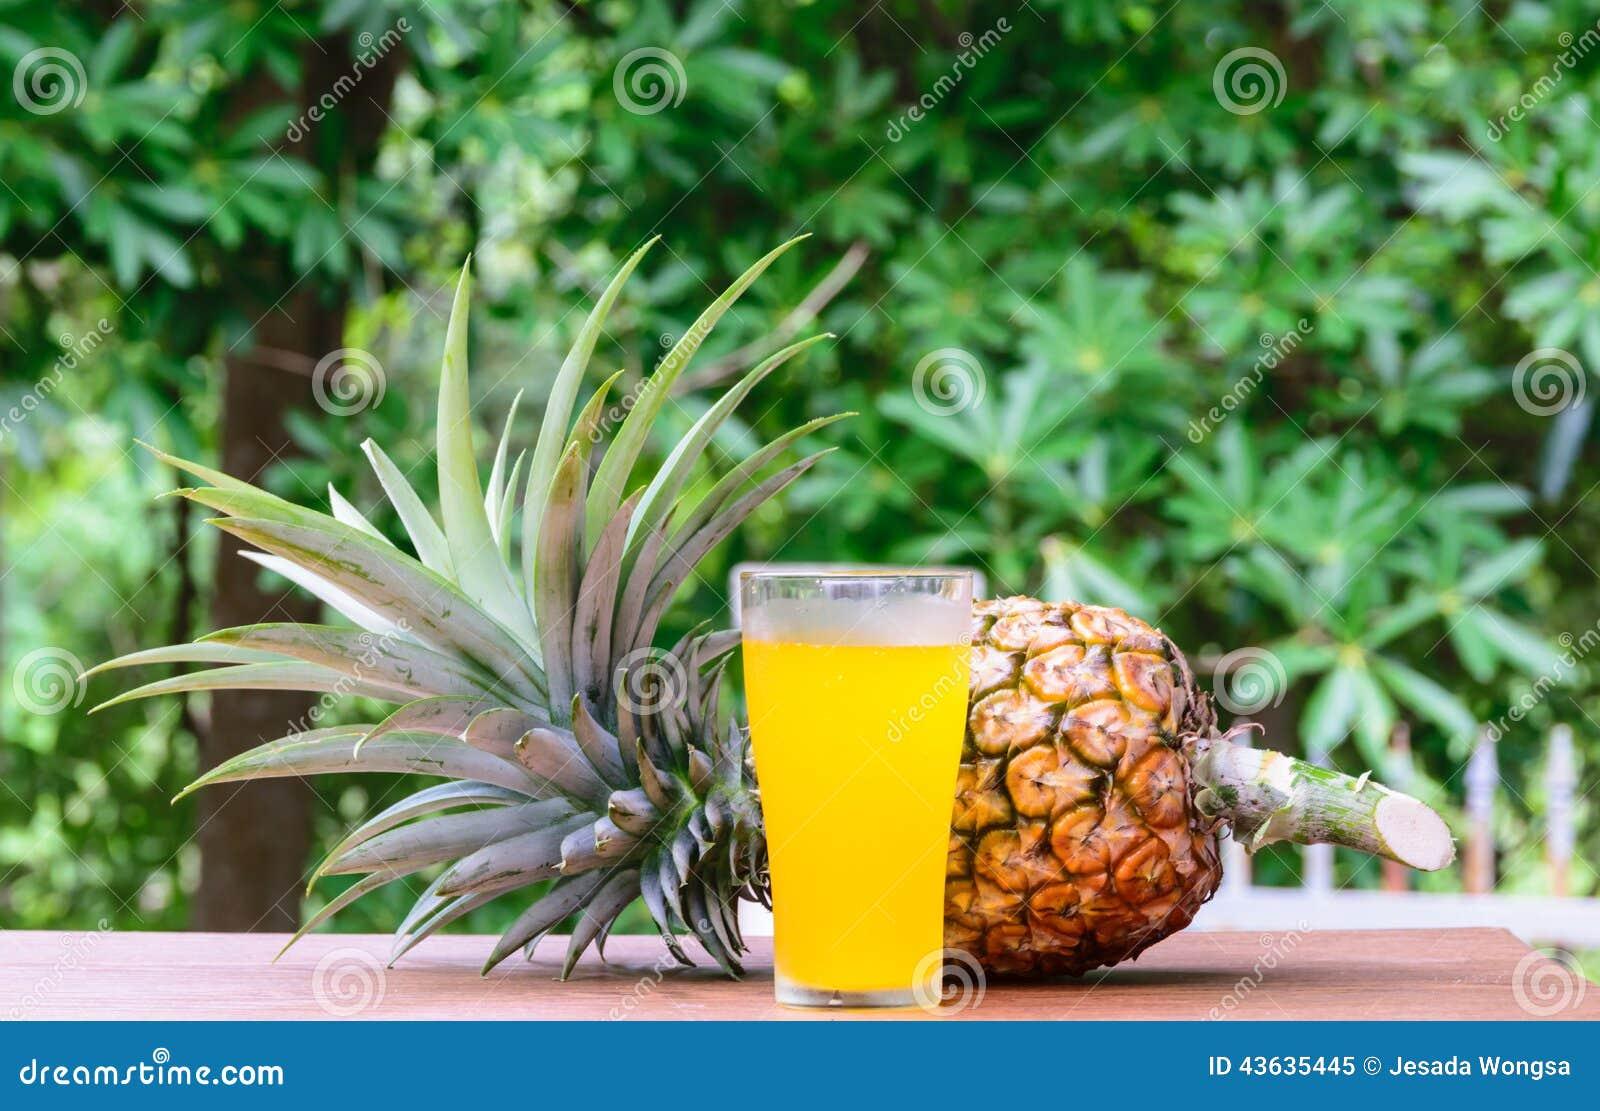 jus d 39 ananas en verre avec des fruits frais photo stock image 43635445. Black Bedroom Furniture Sets. Home Design Ideas